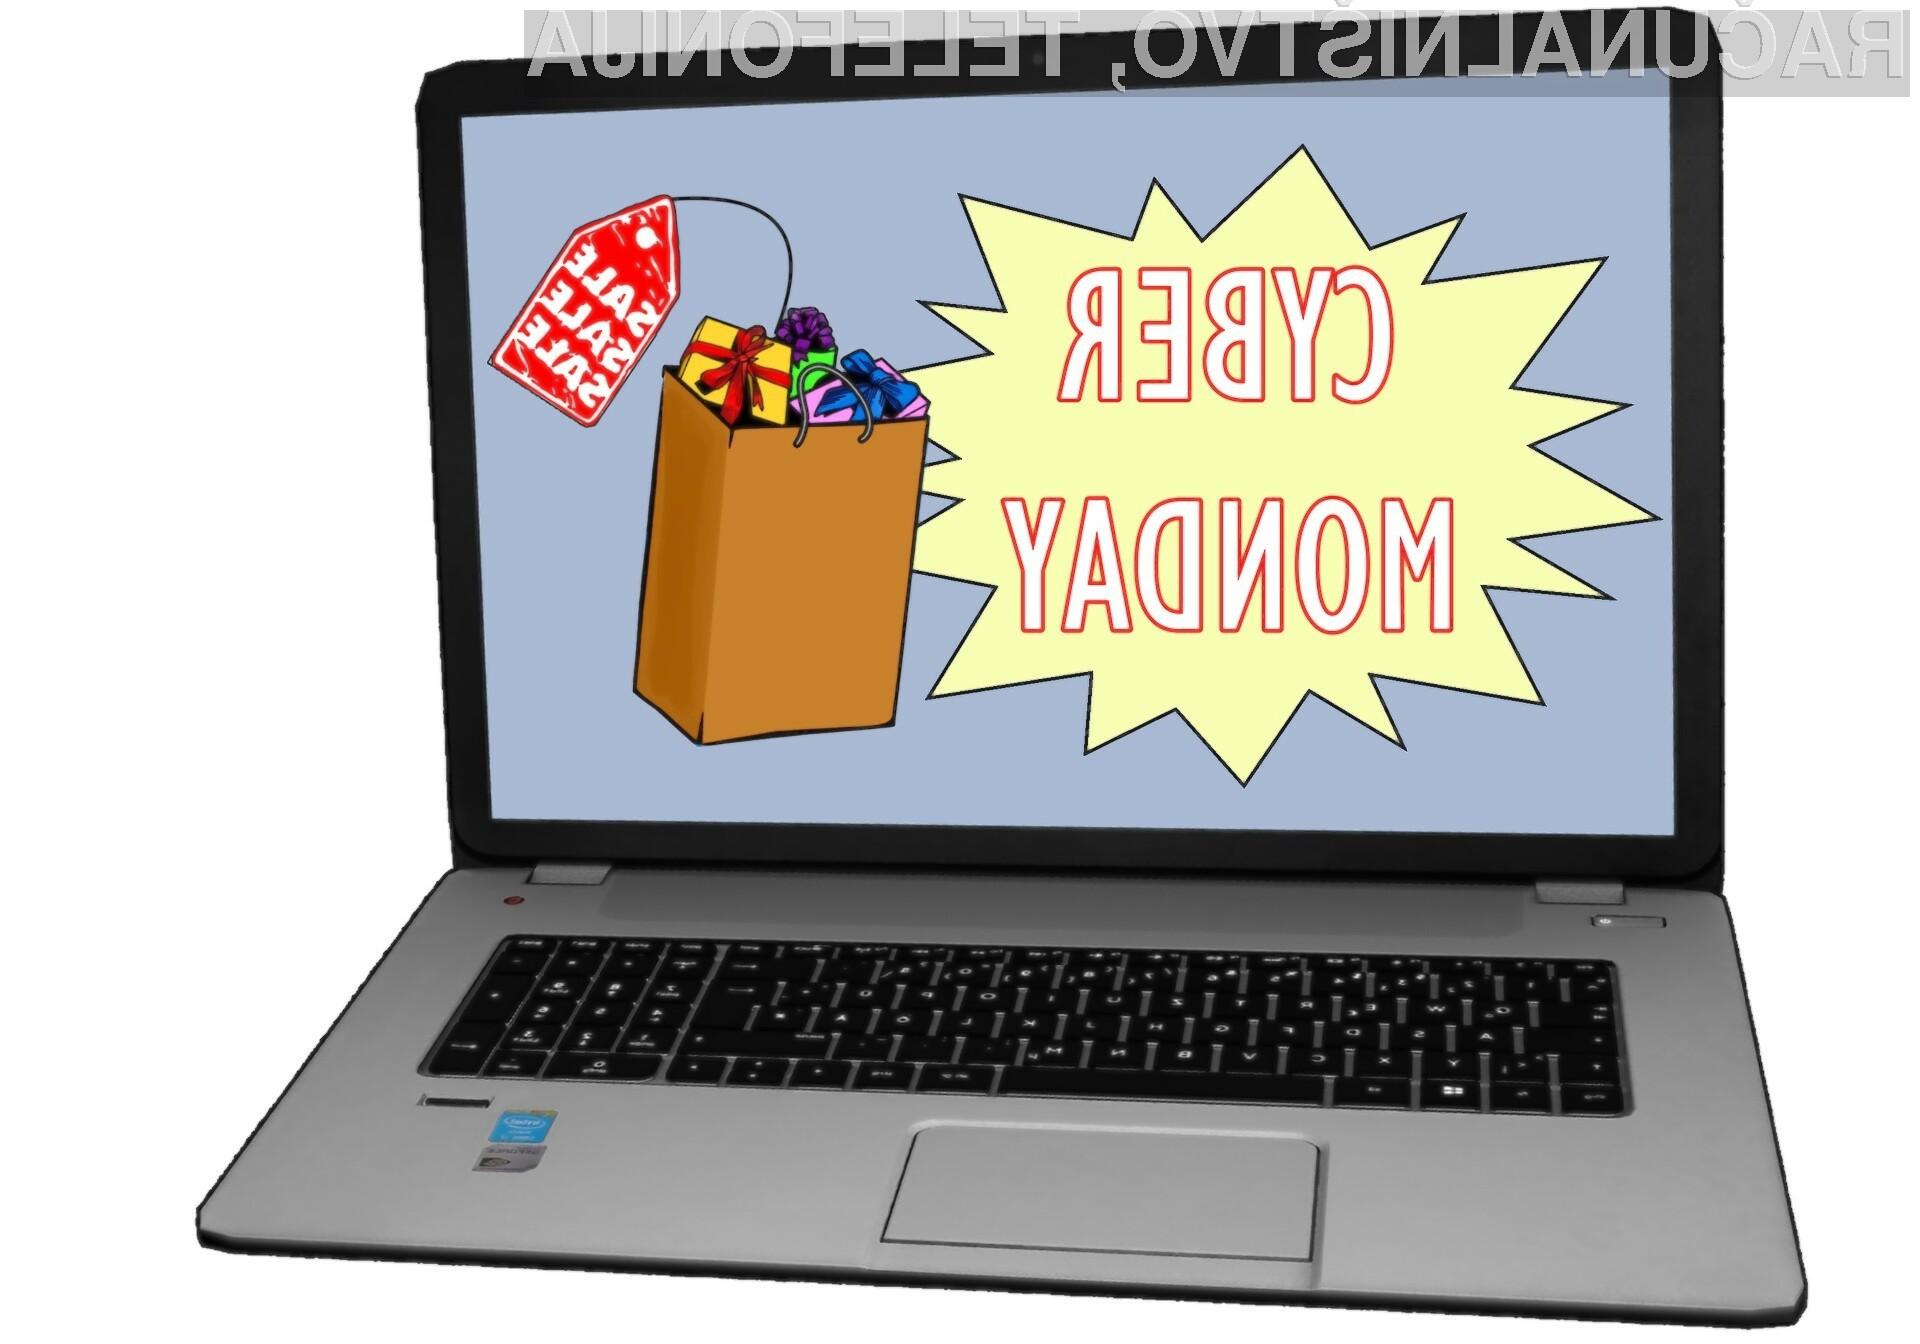 cyber-monday-3828513_1920.jpg